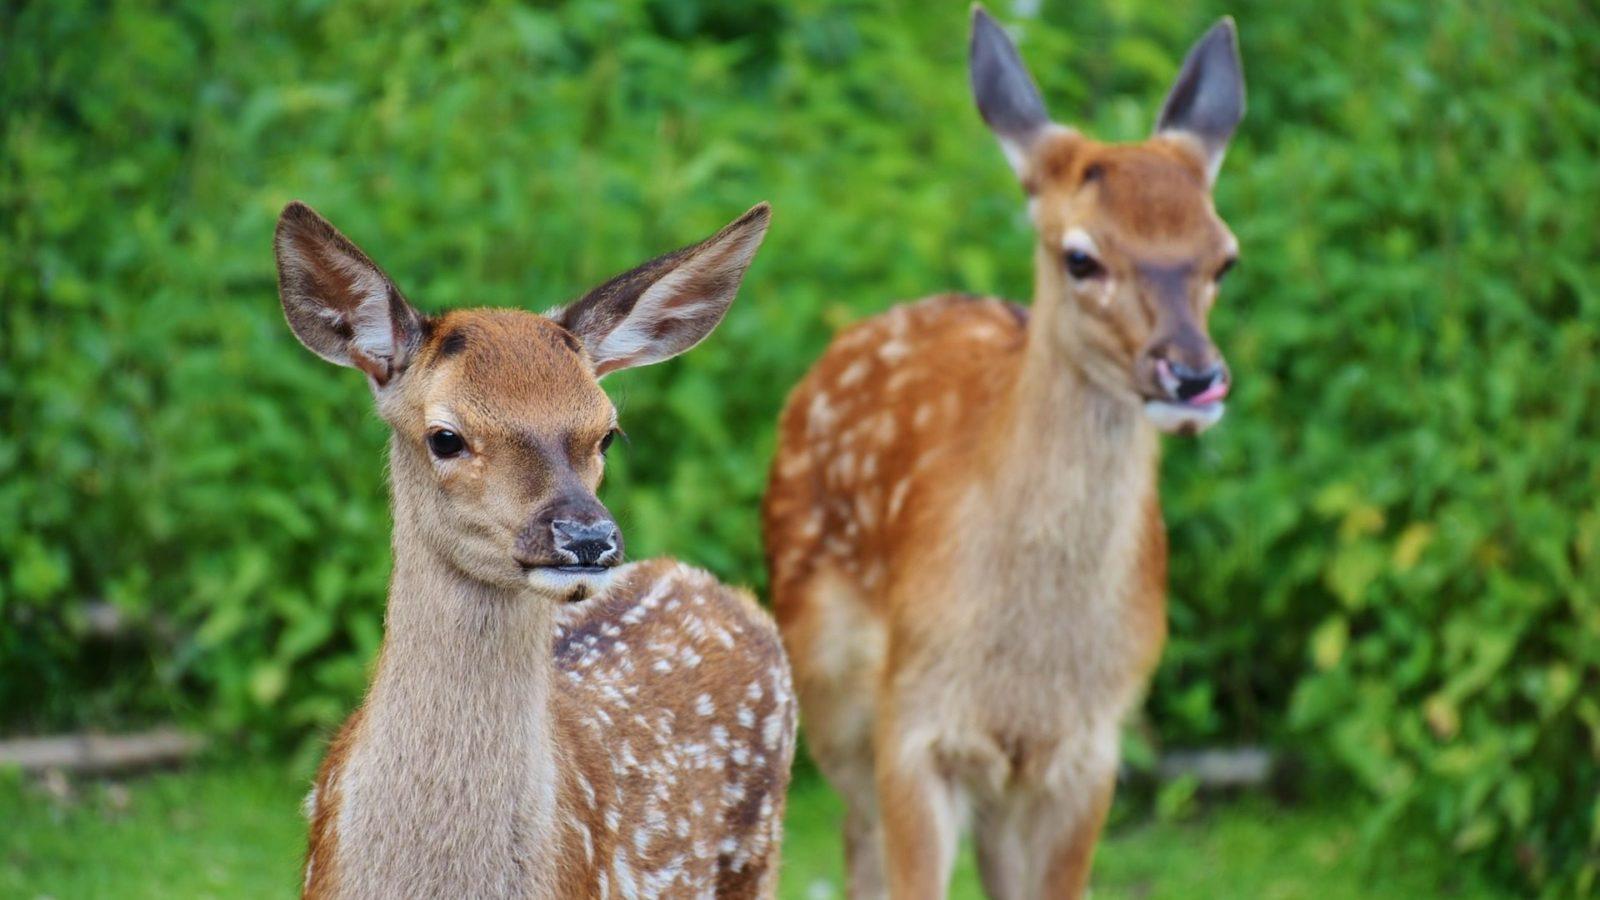 Deer in the backyard